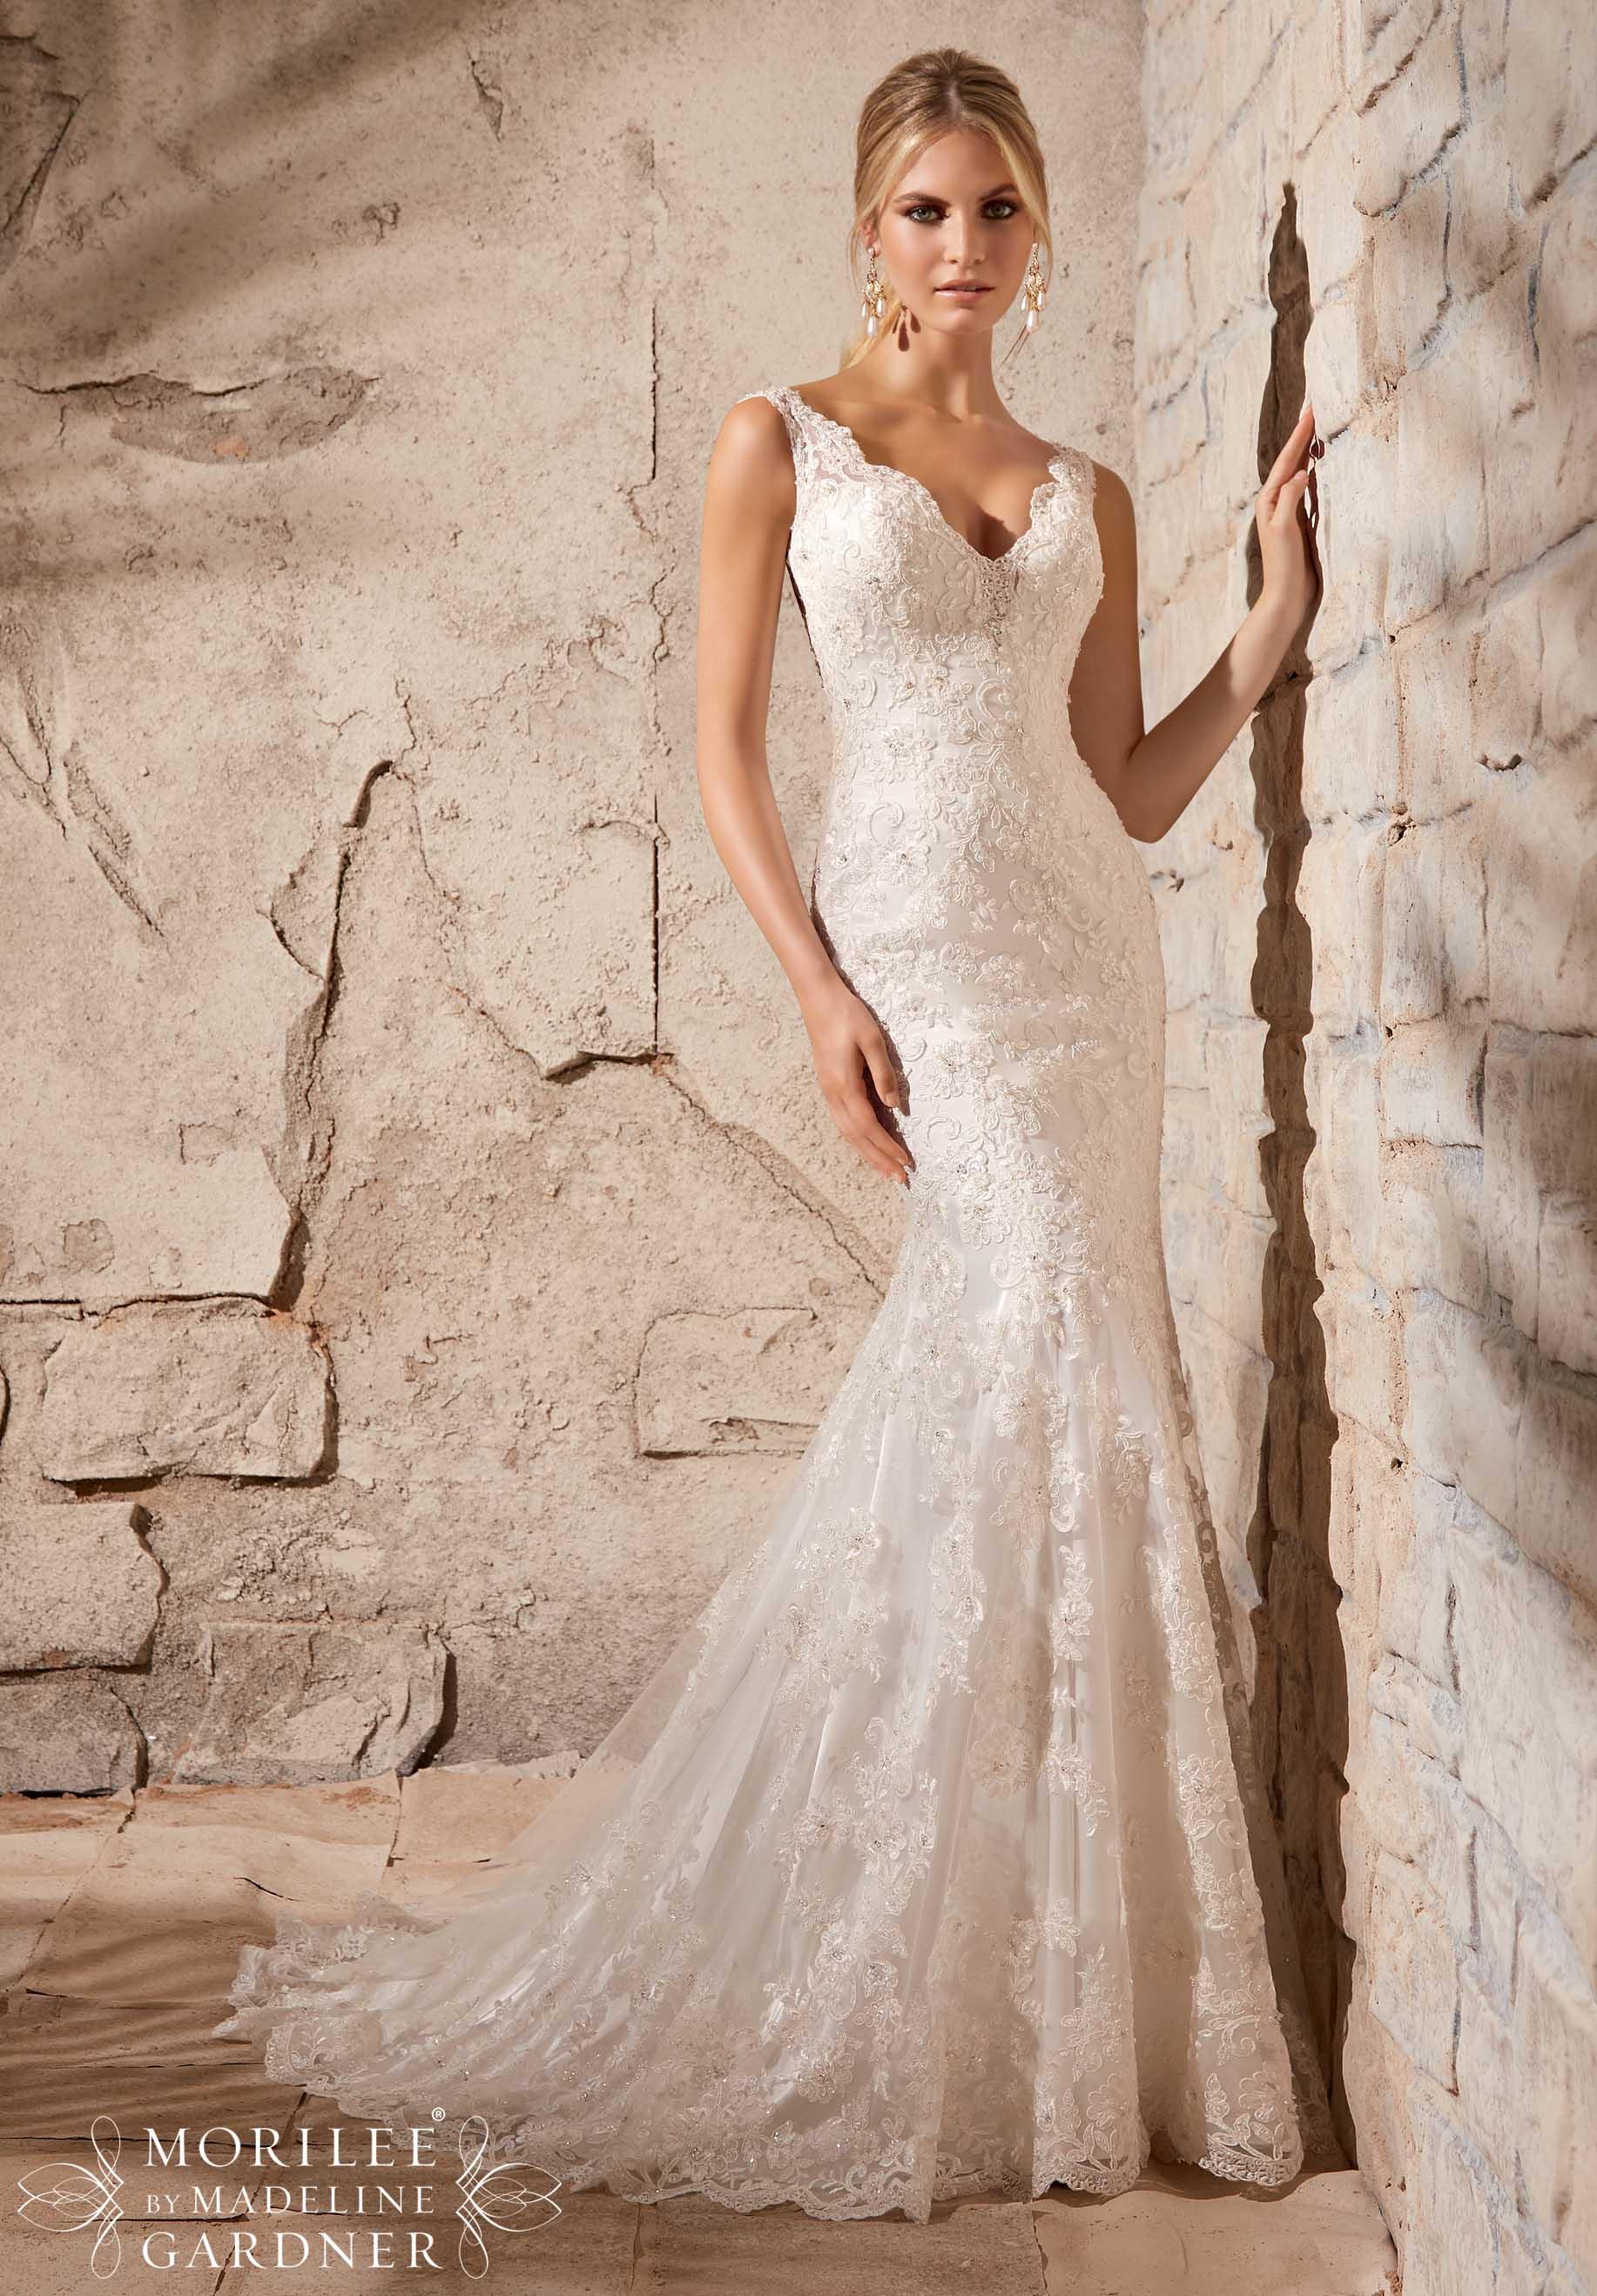 Should I add a belt/sash to my wedding dress?